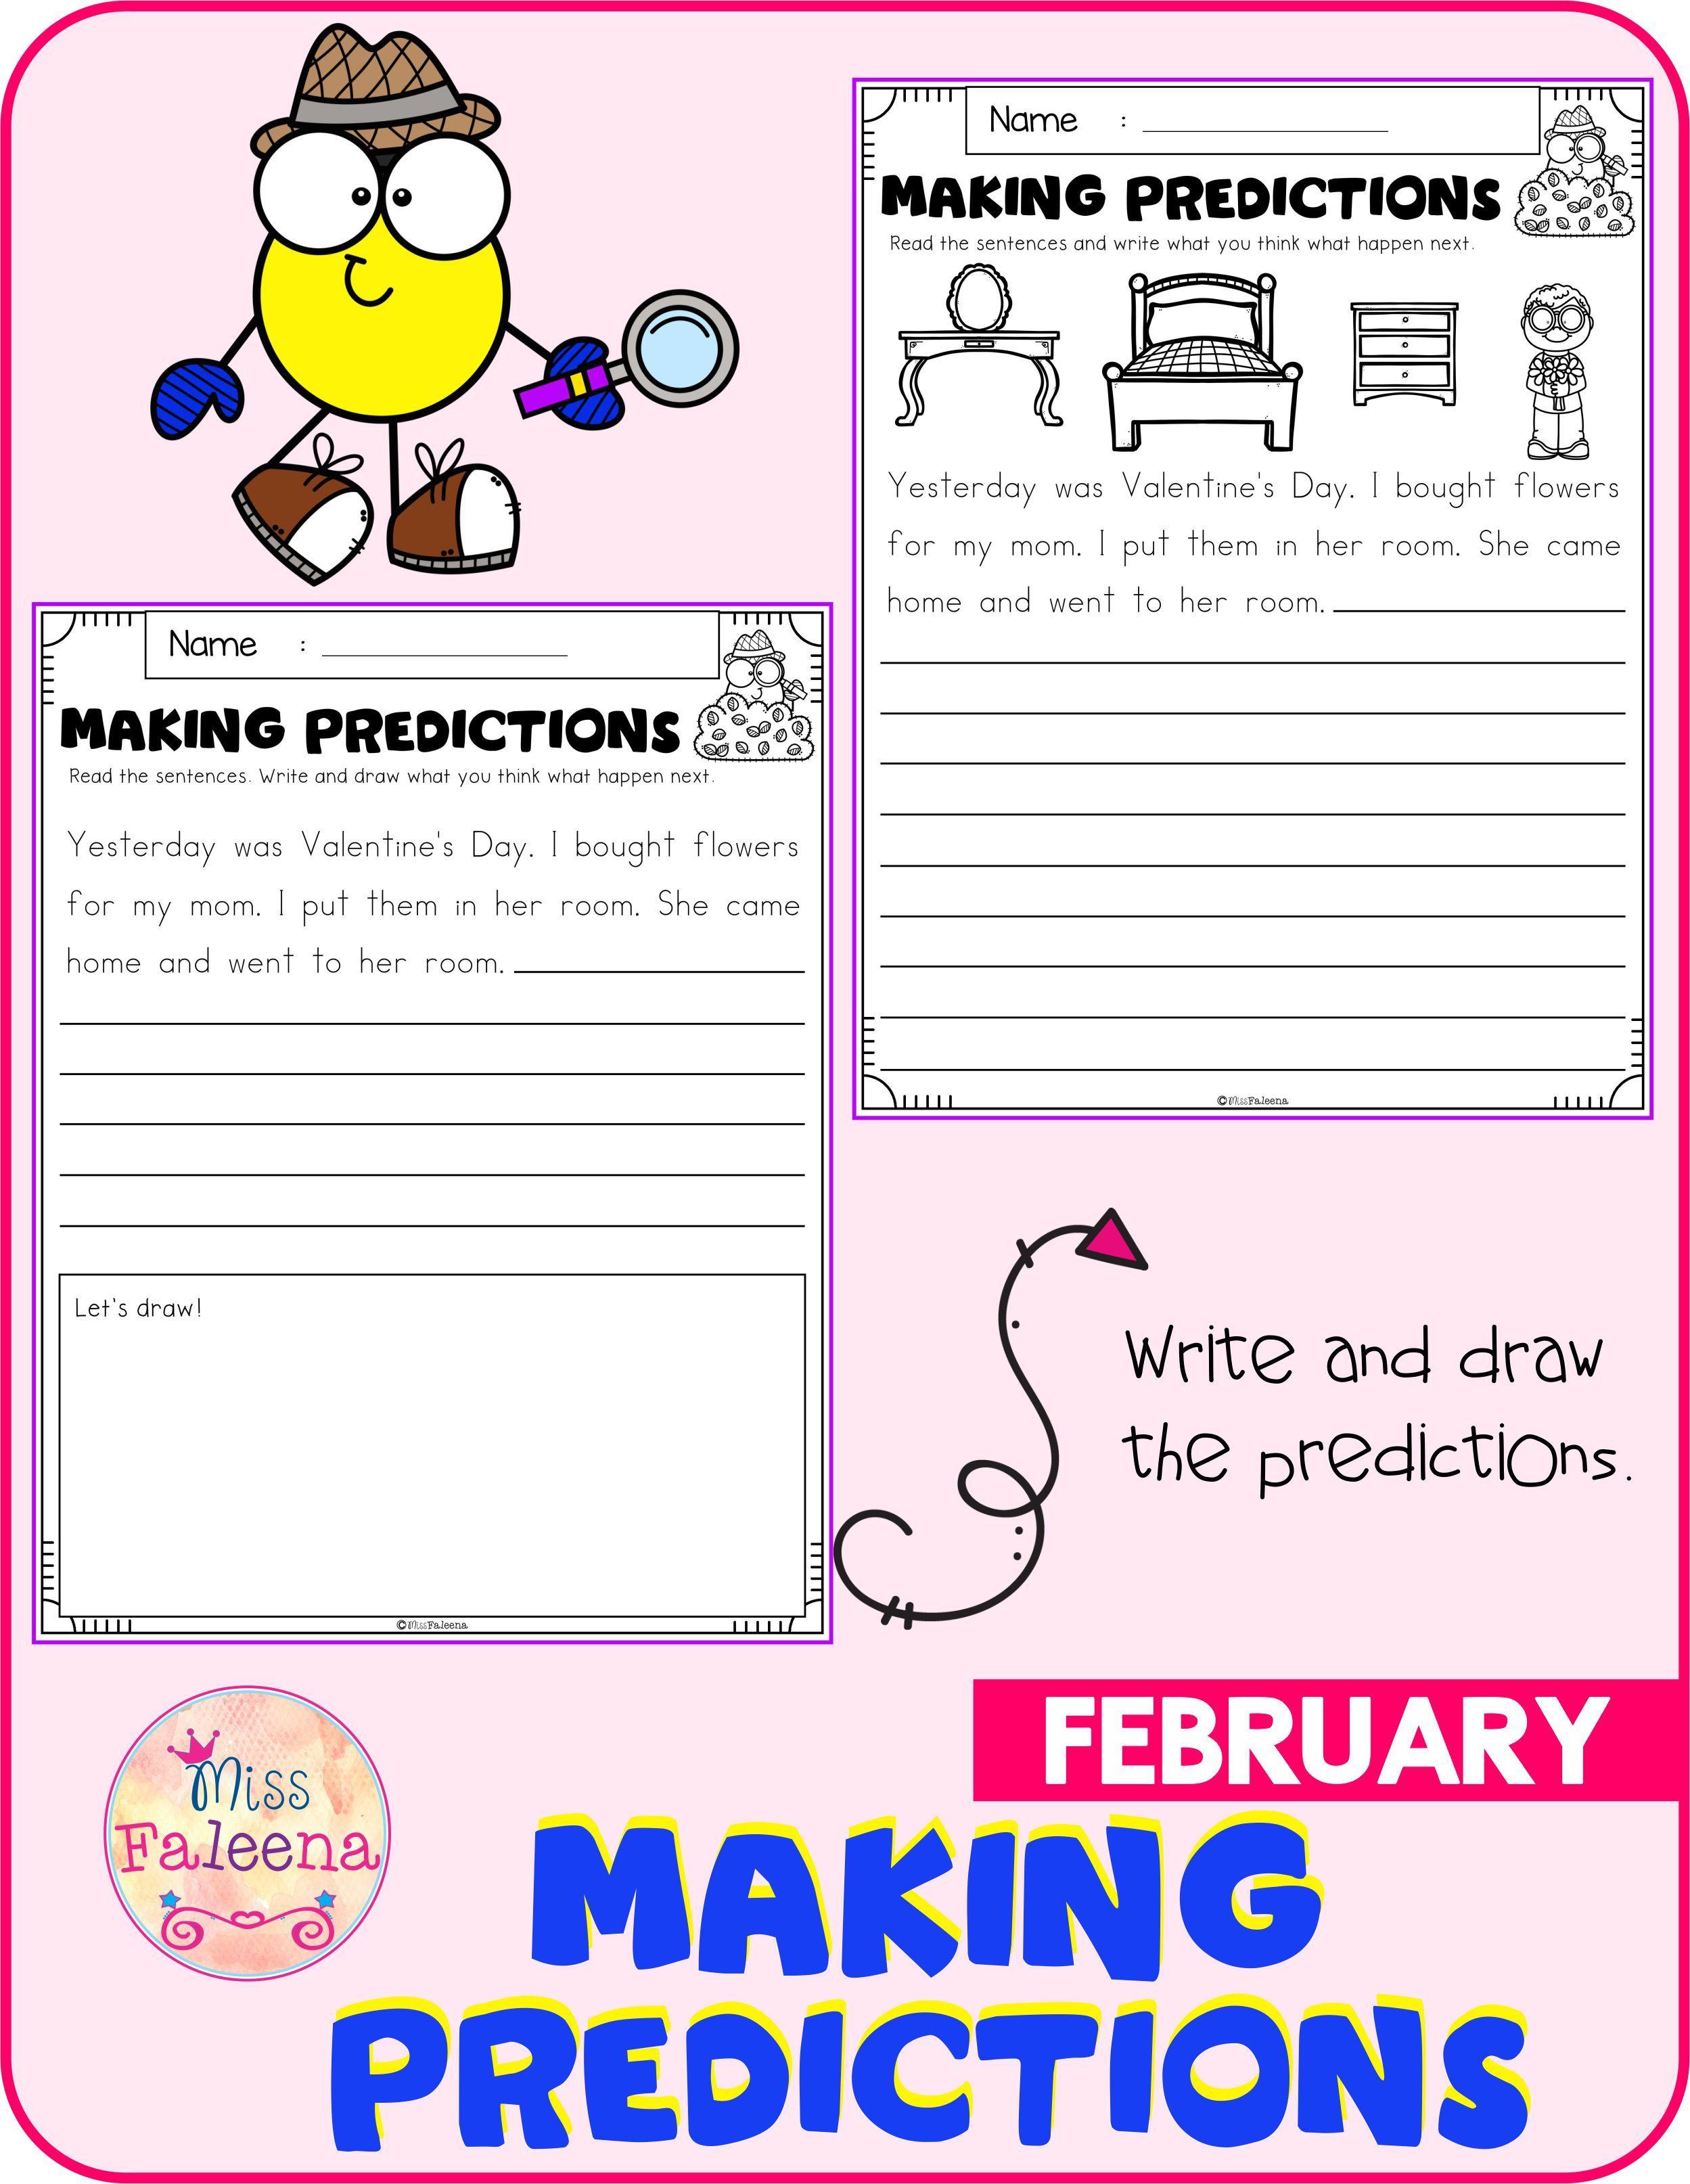 February Making Predictions